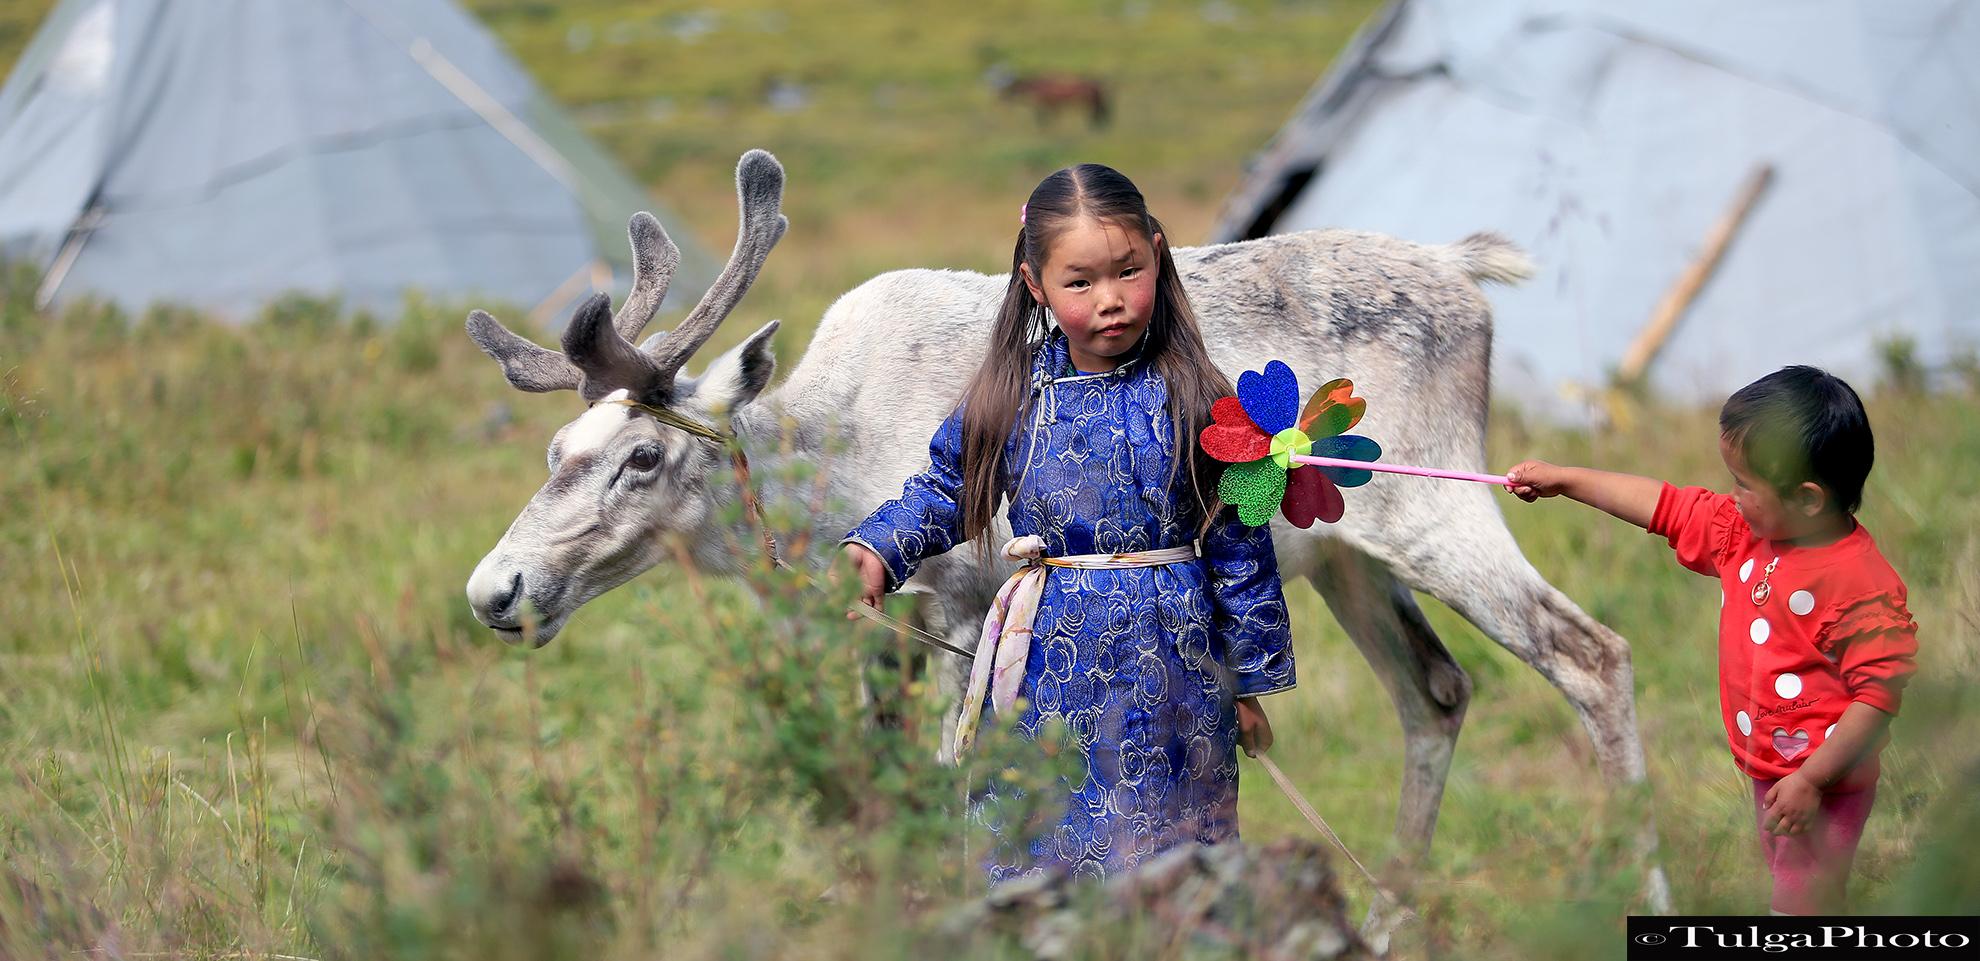 REINDEER HERDERS or TSAATAN TRIBE in TAIGA, NORTH MONGOLIA